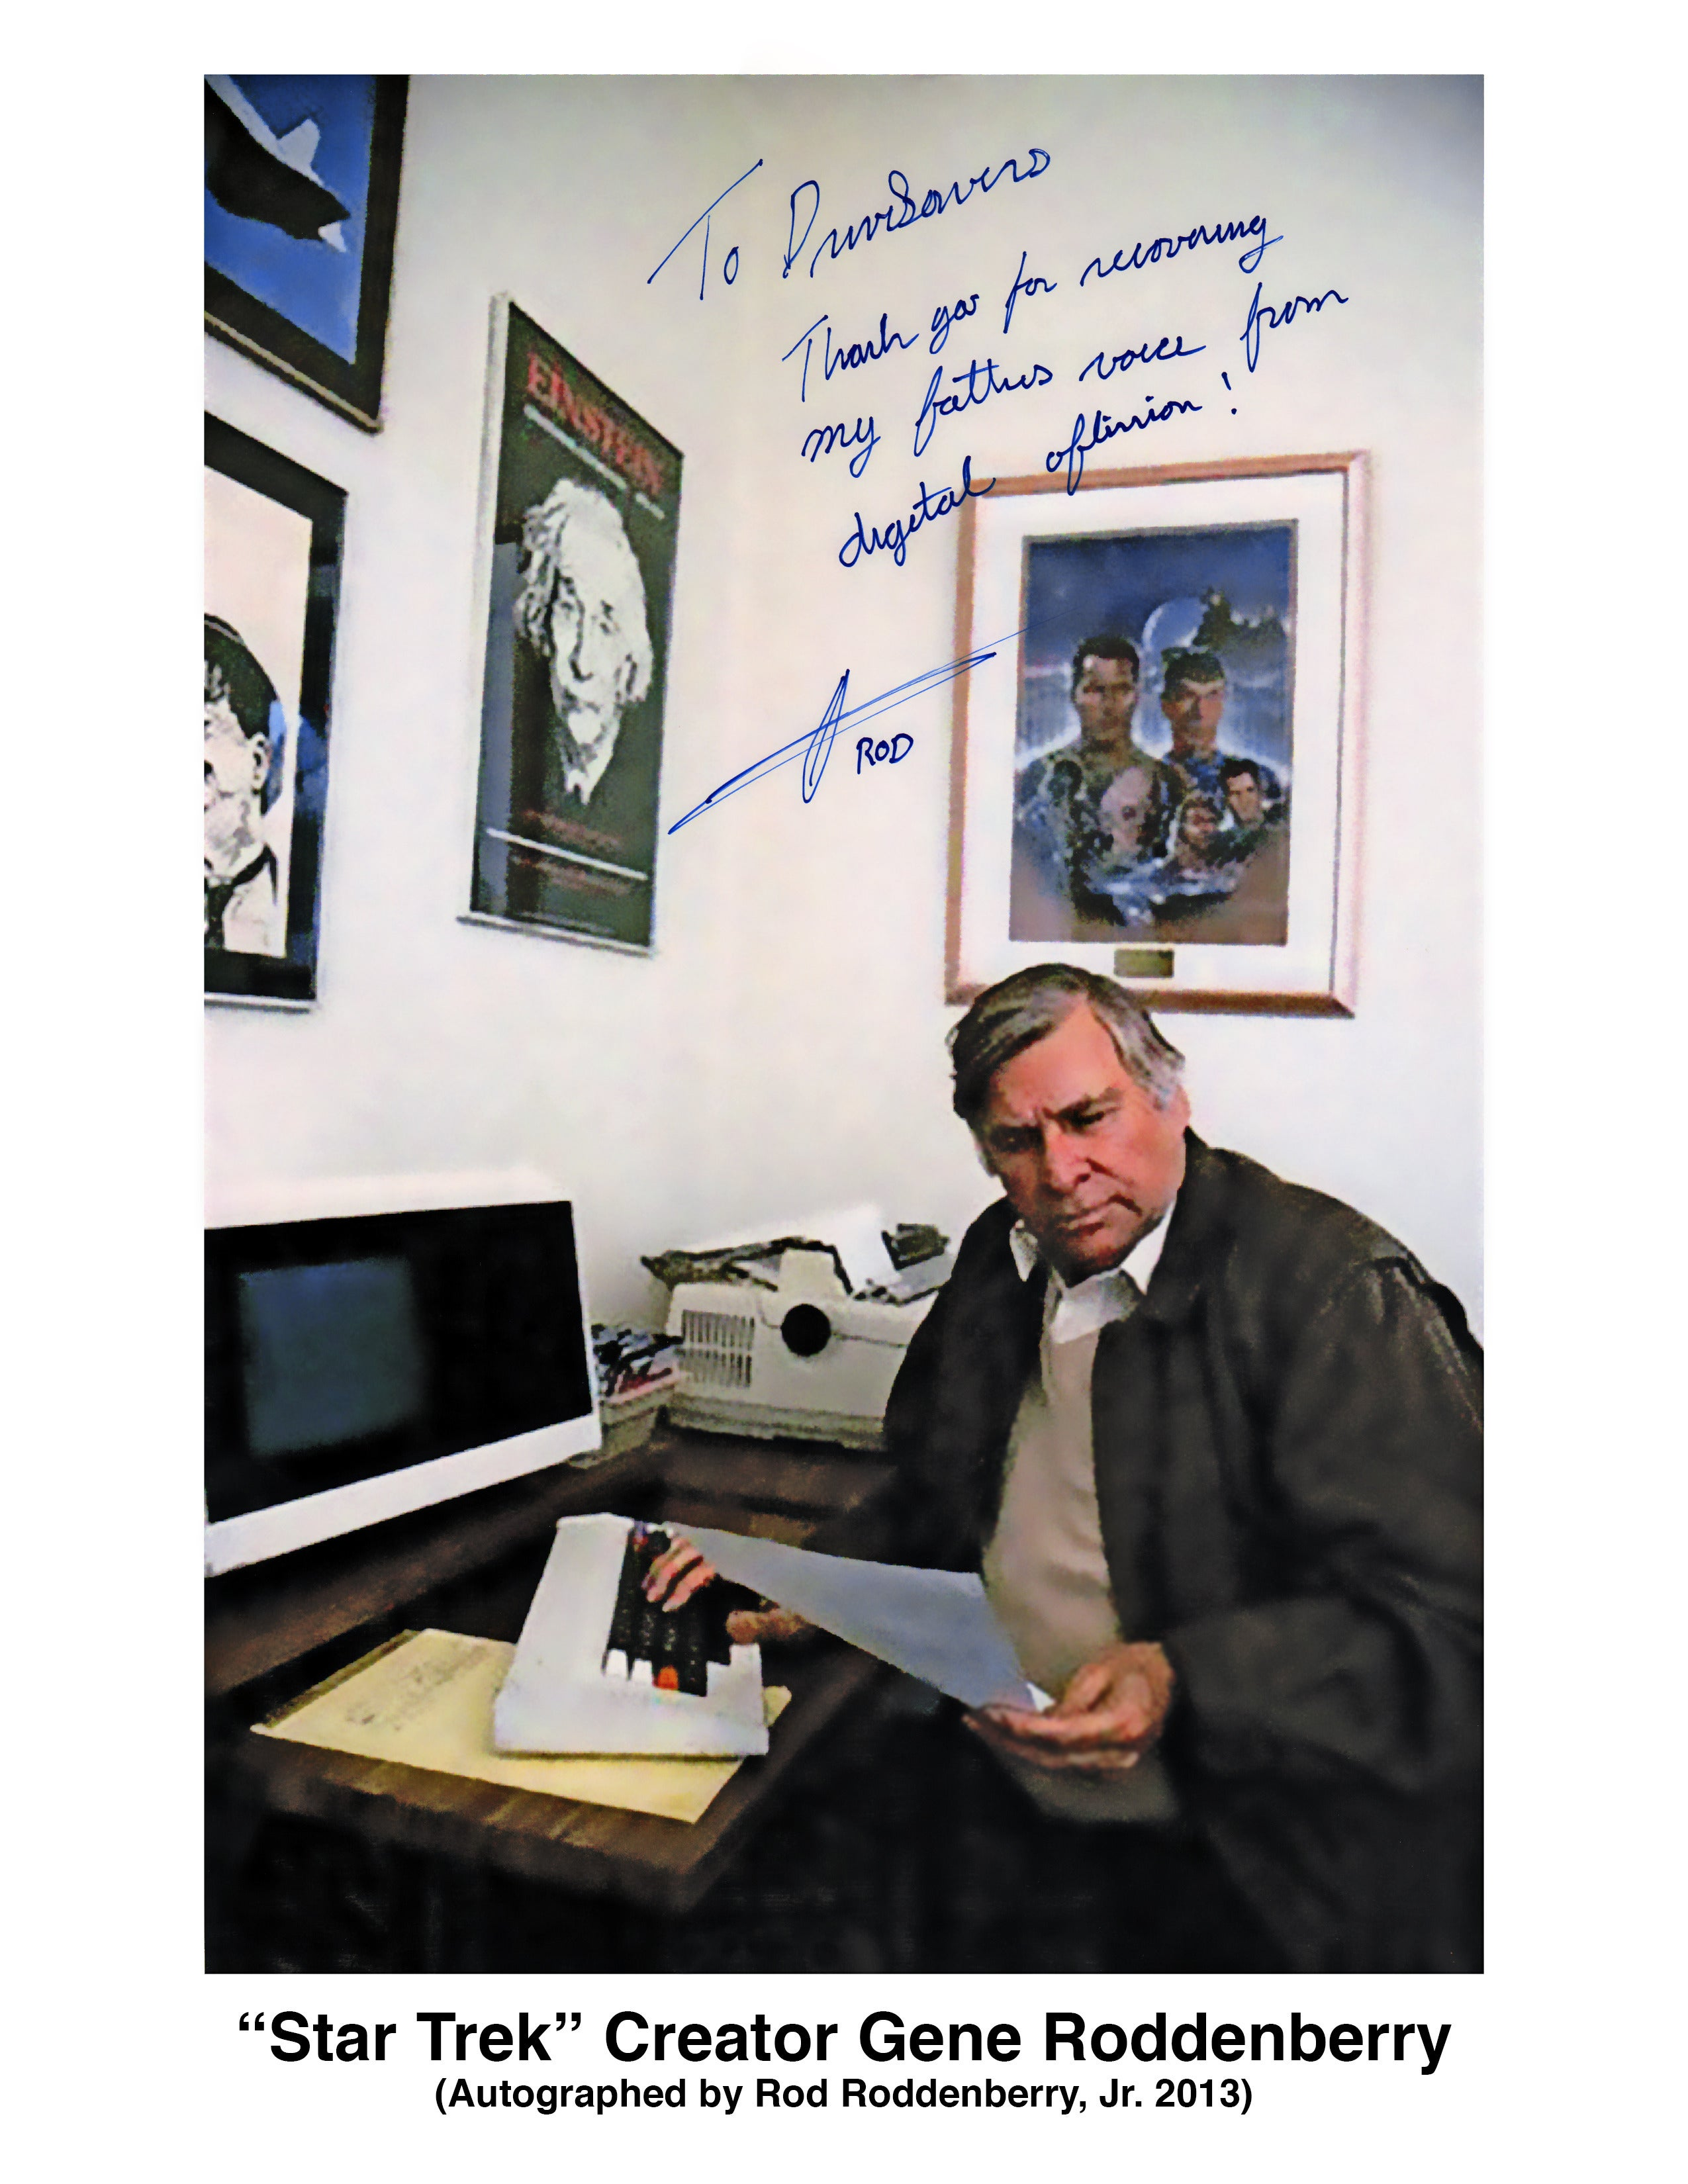 How Star Trek creator Gene Roddenberry's words were freed from old floppy disks